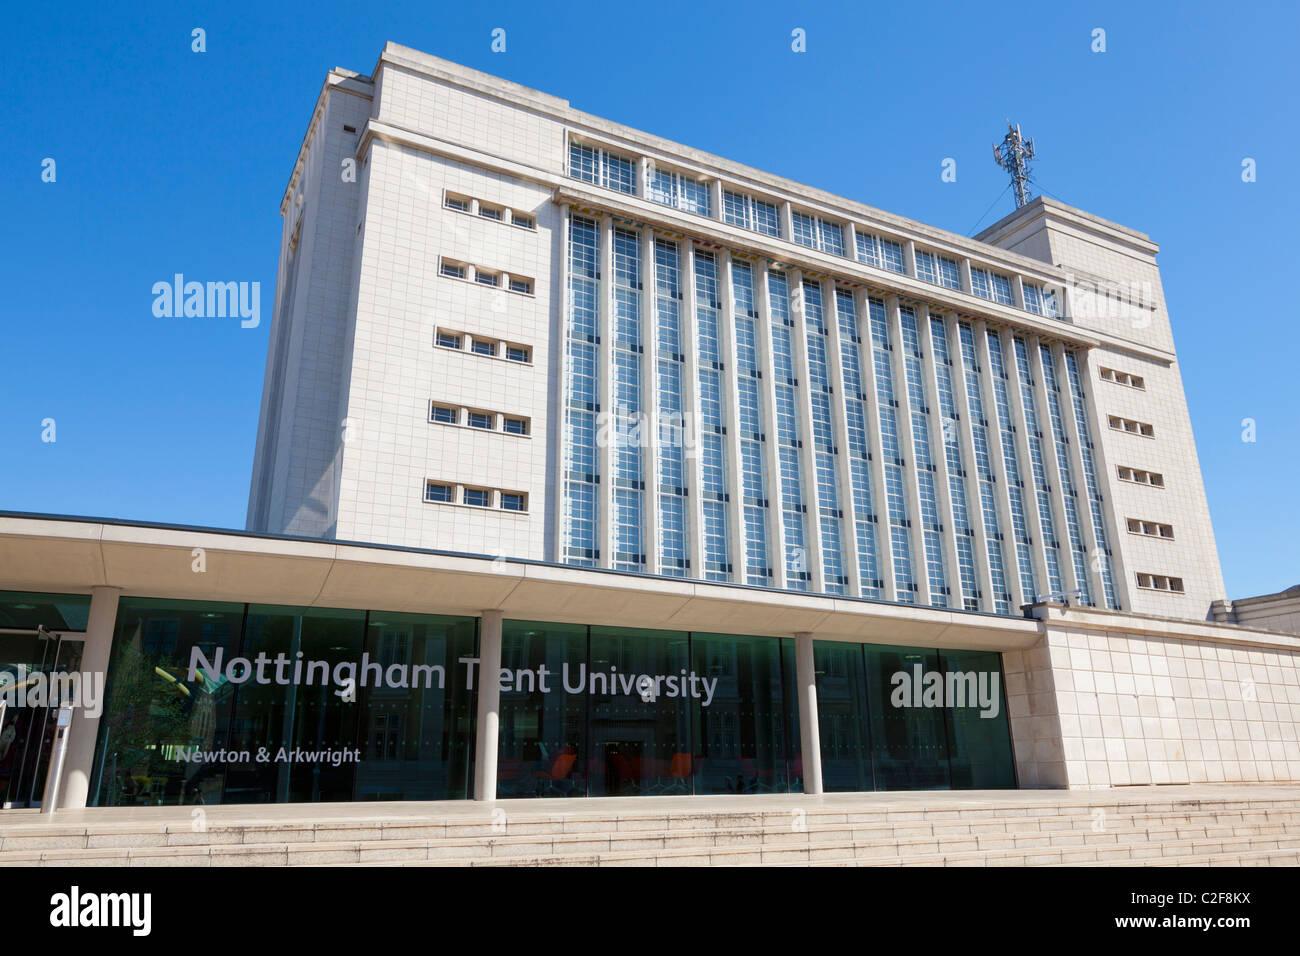 Newton y Arkwright edificios, Nottingham Trent University, Nottingham, Reino Unido Imagen De Stock